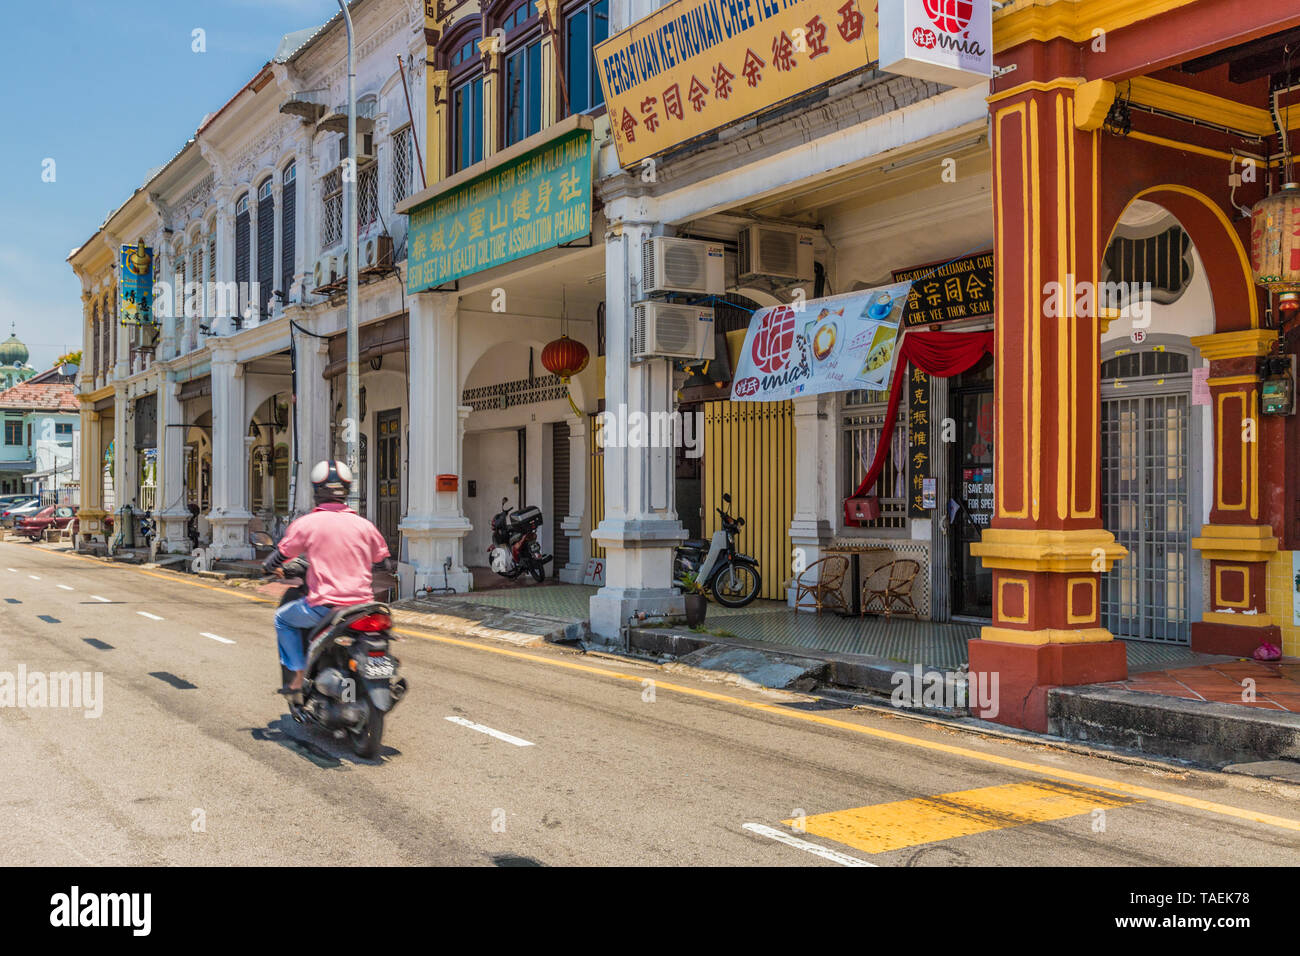 A streetv scene in George Town Malaysia - Stock Image